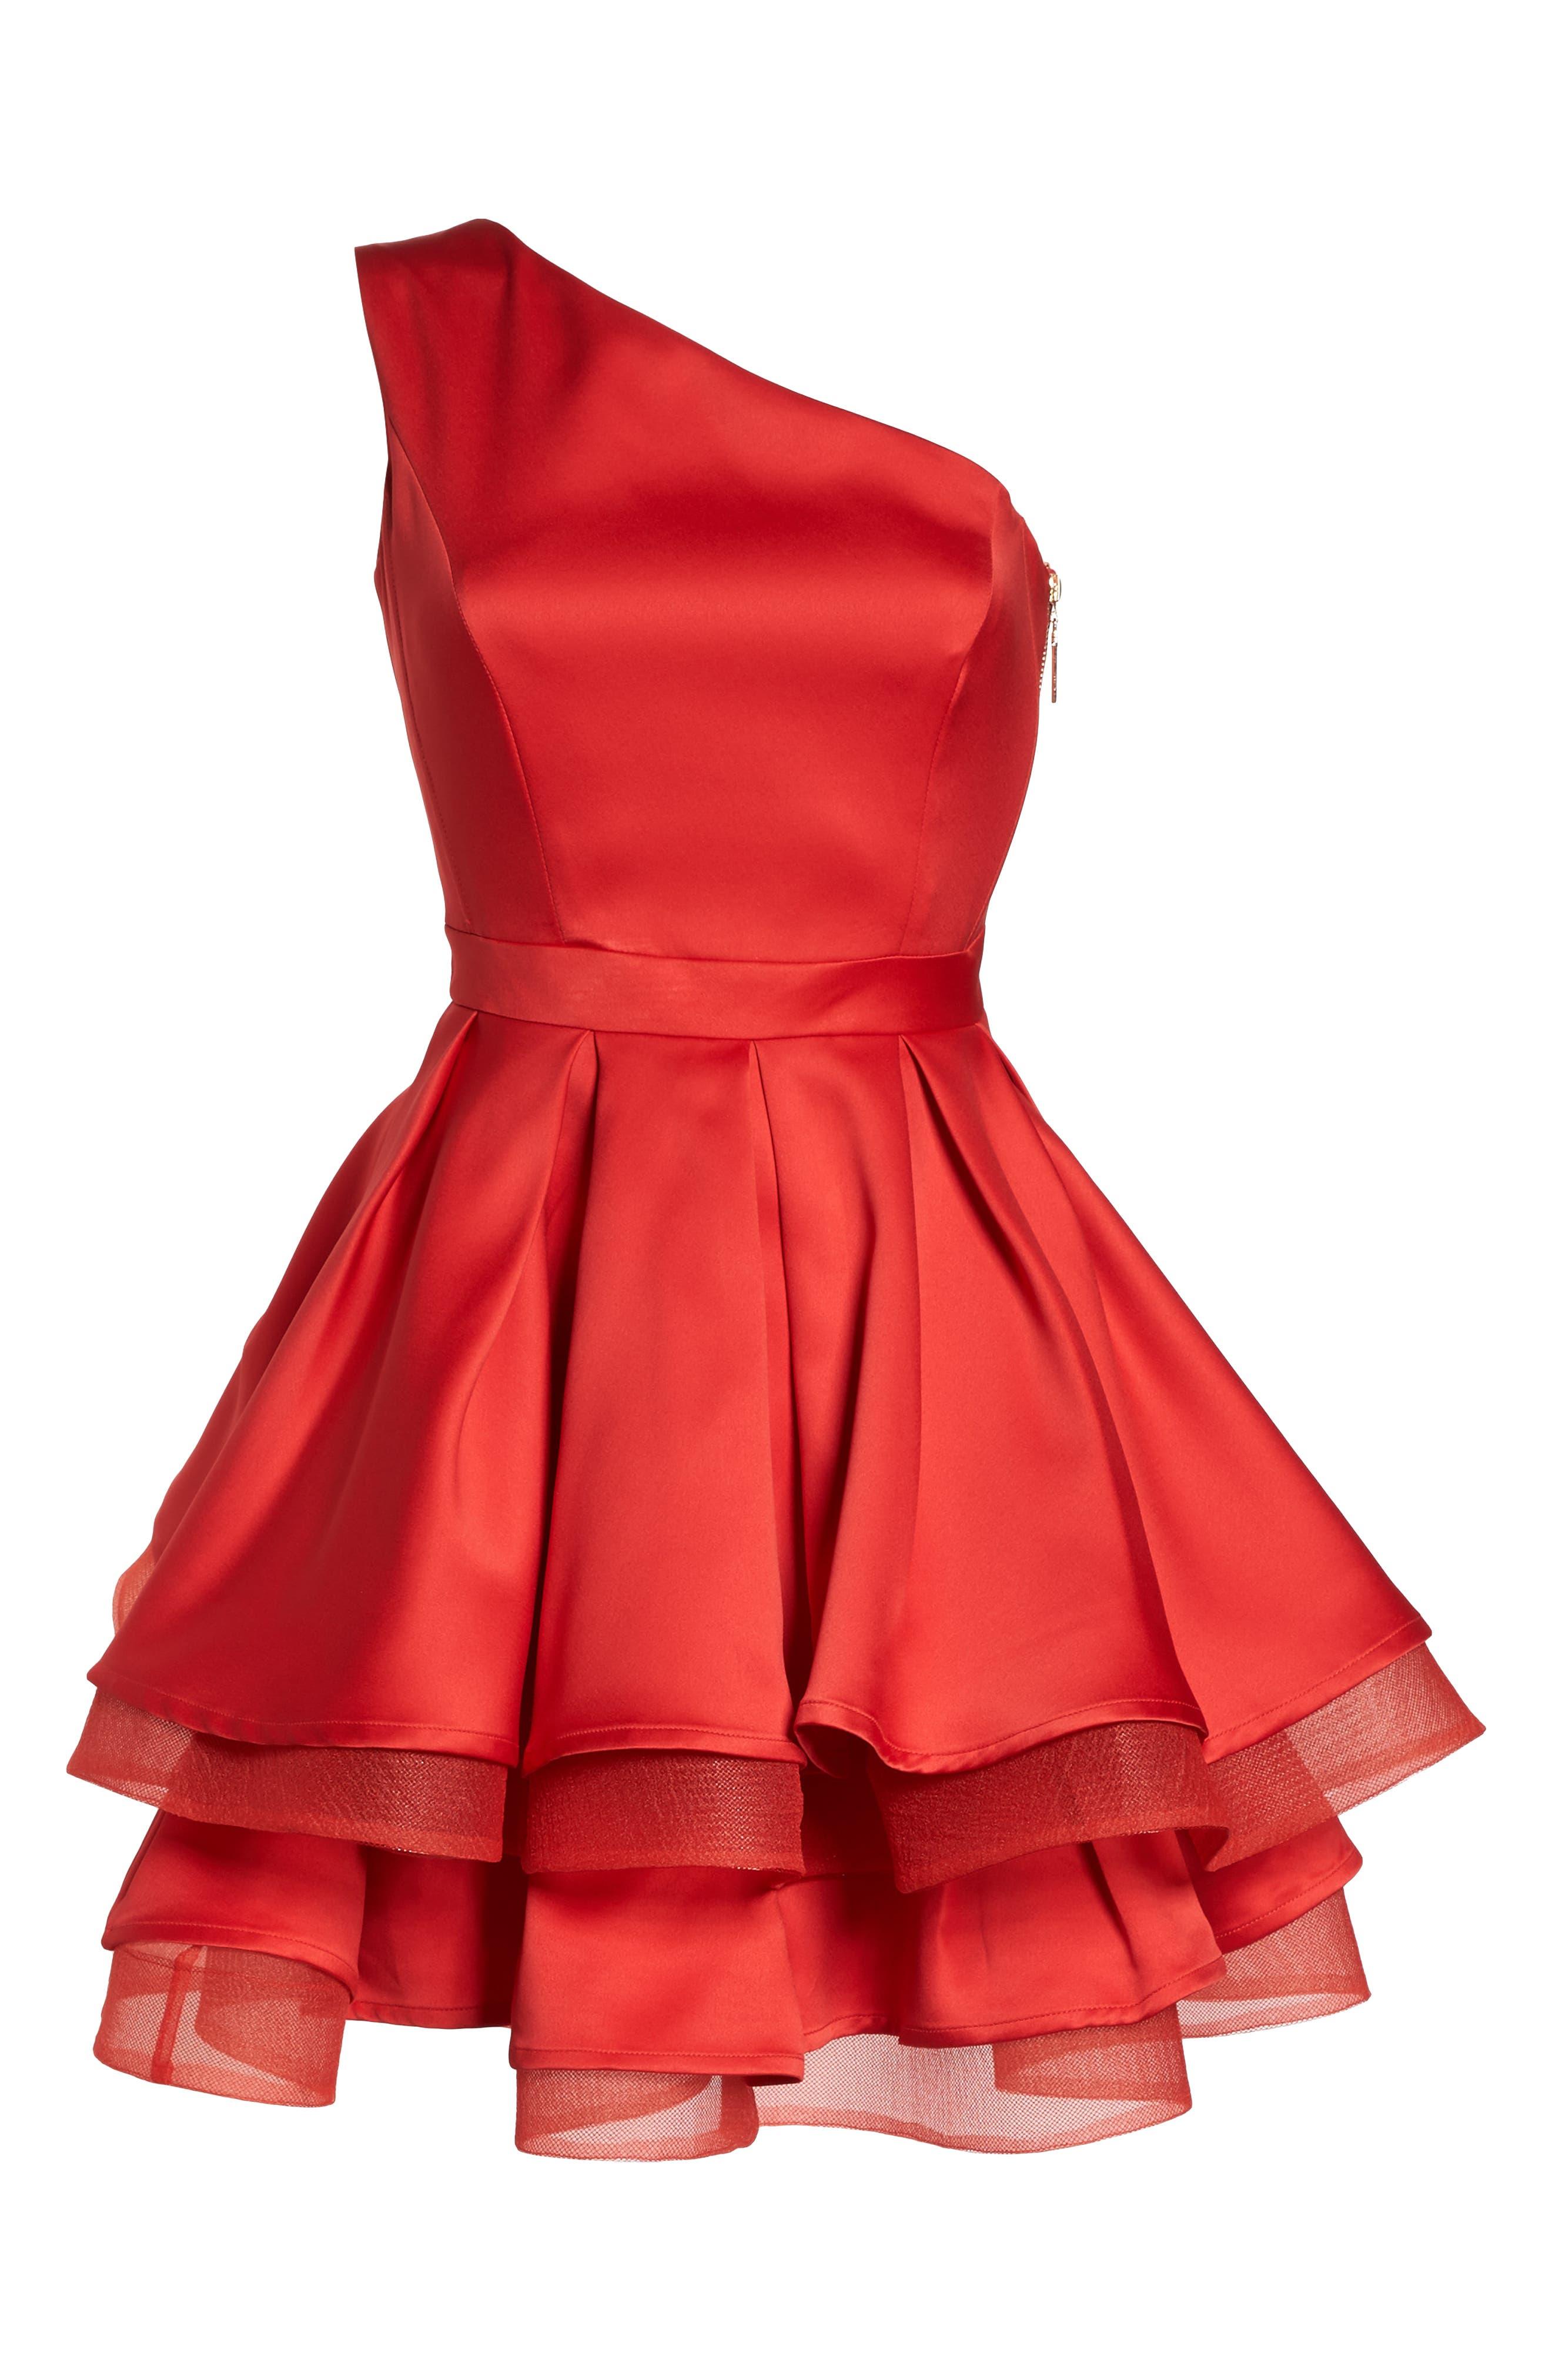 Emmanuel One-Shoulder Party Dress,                             Alternate thumbnail 6, color,                             600